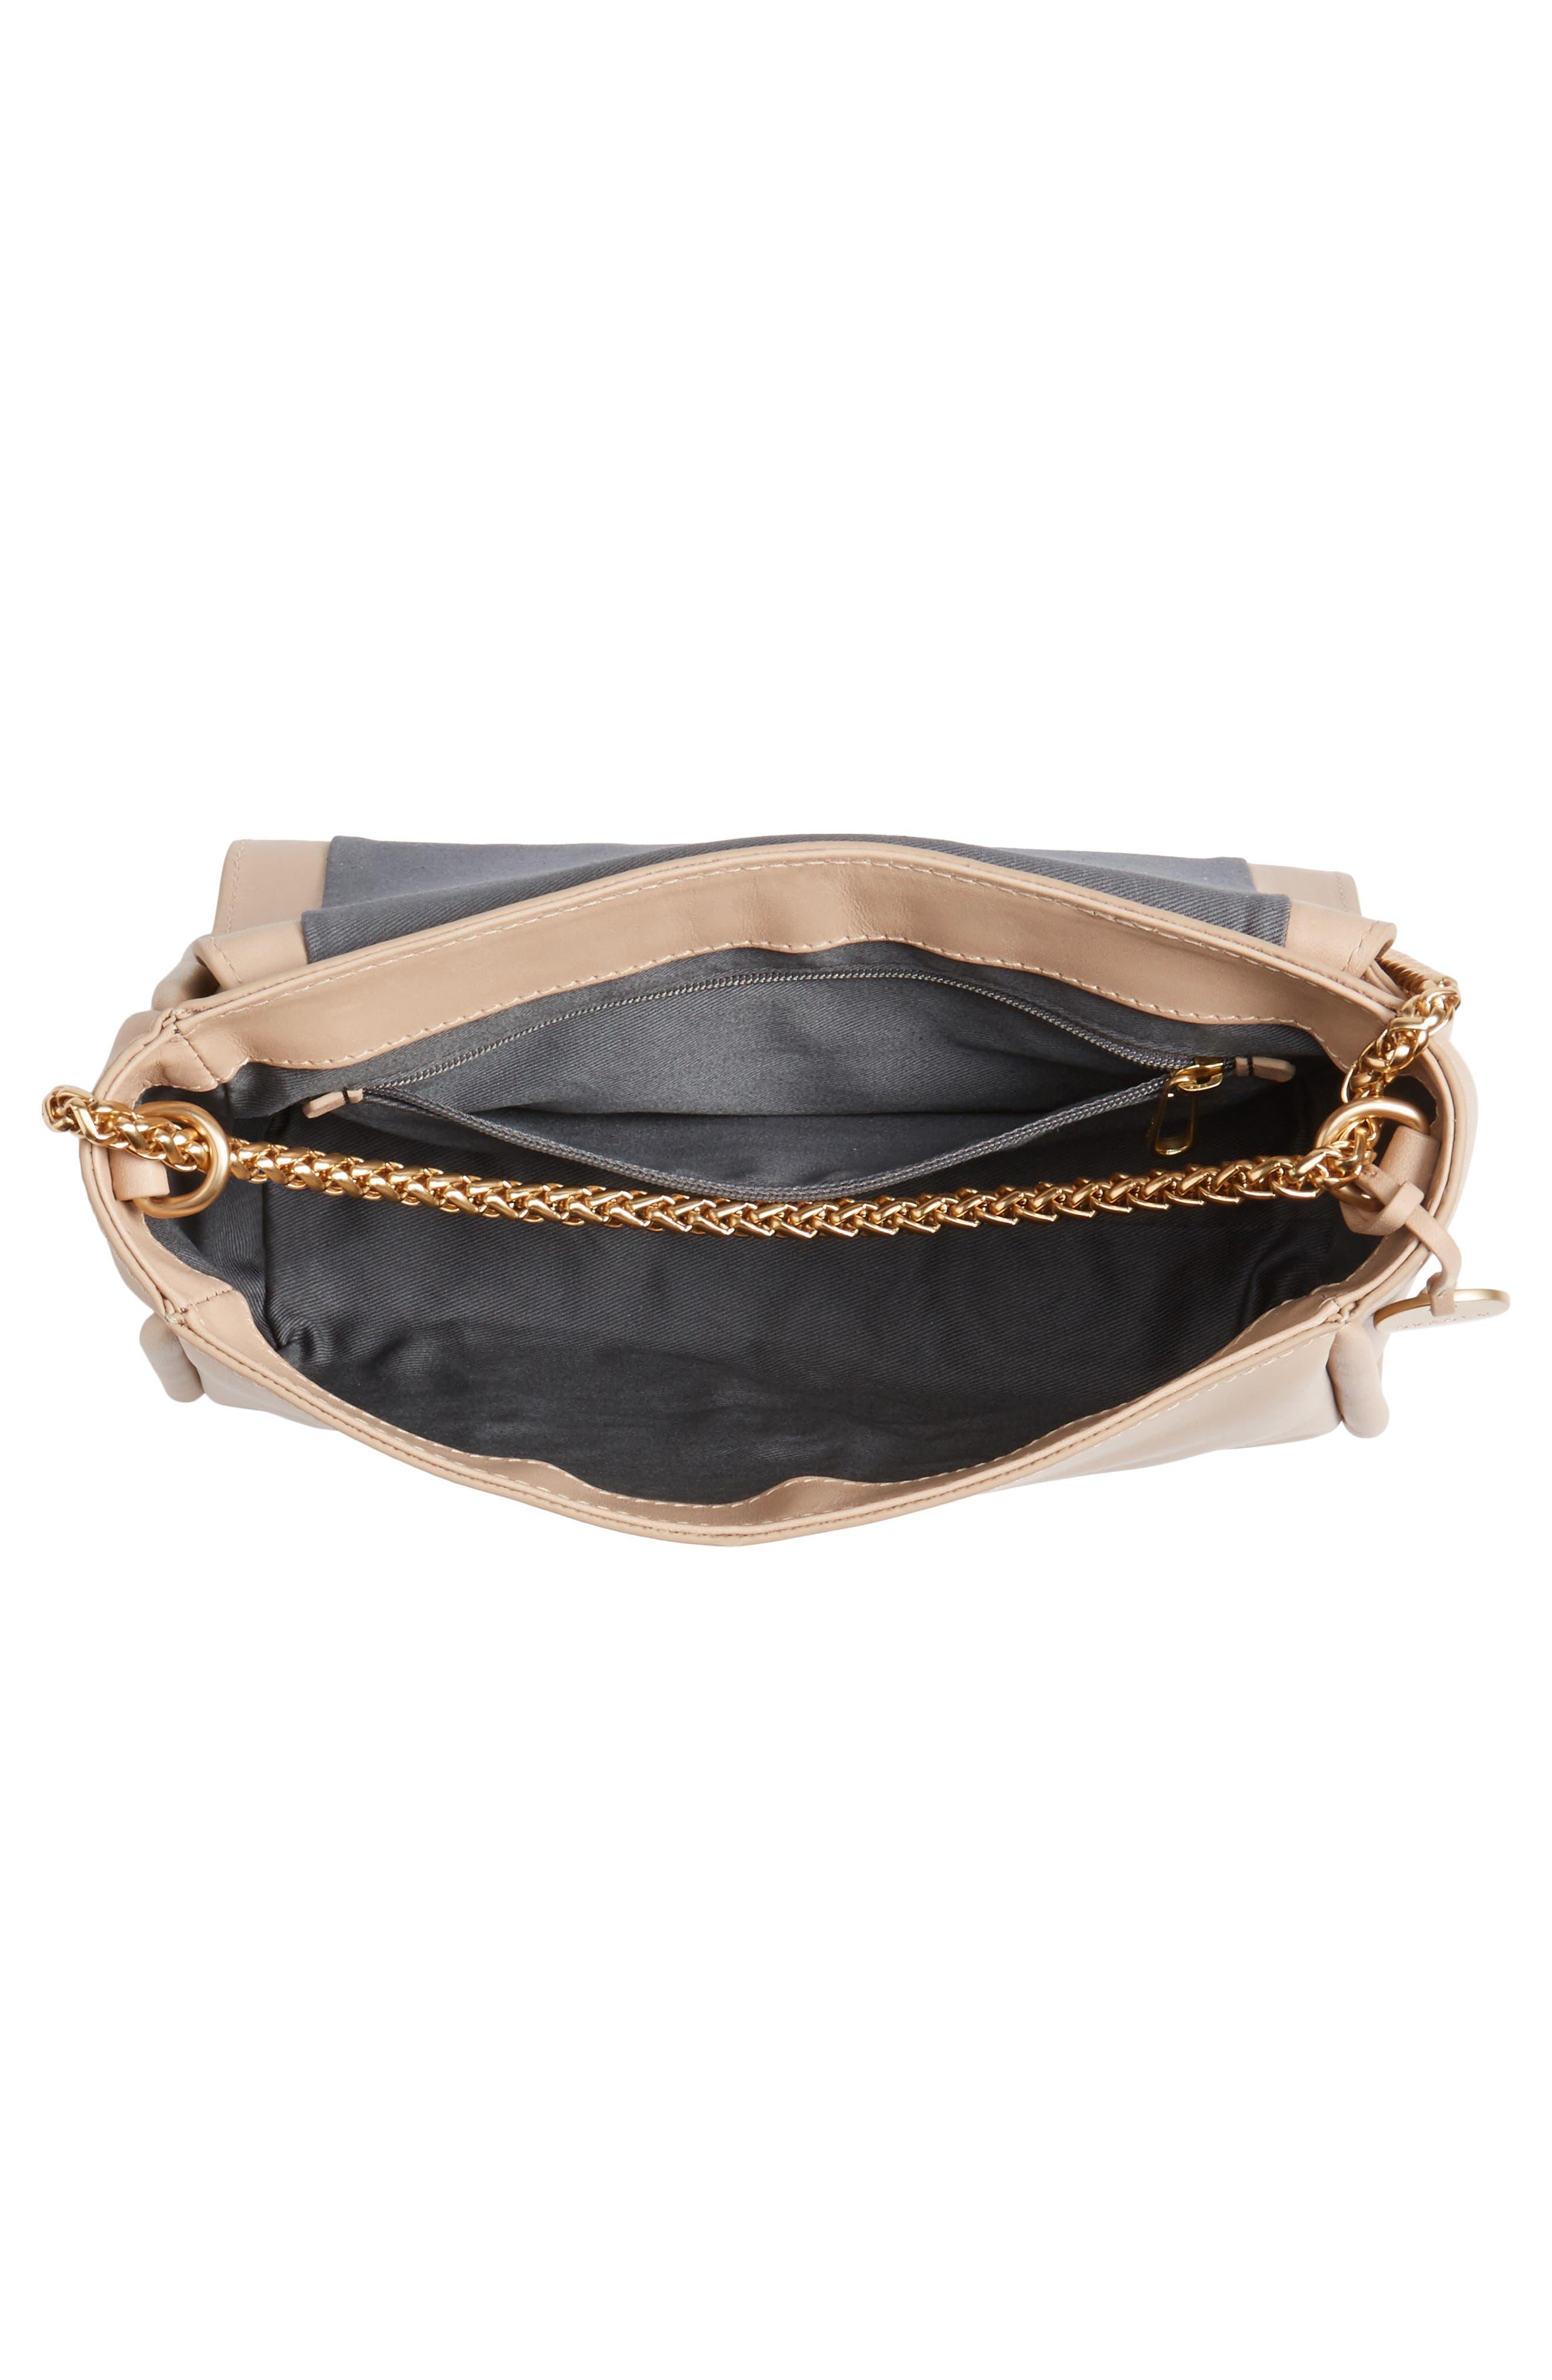 Sylvi Calfskin Leather Crossbody Bag,                             Alternate thumbnail 4, color,                             251